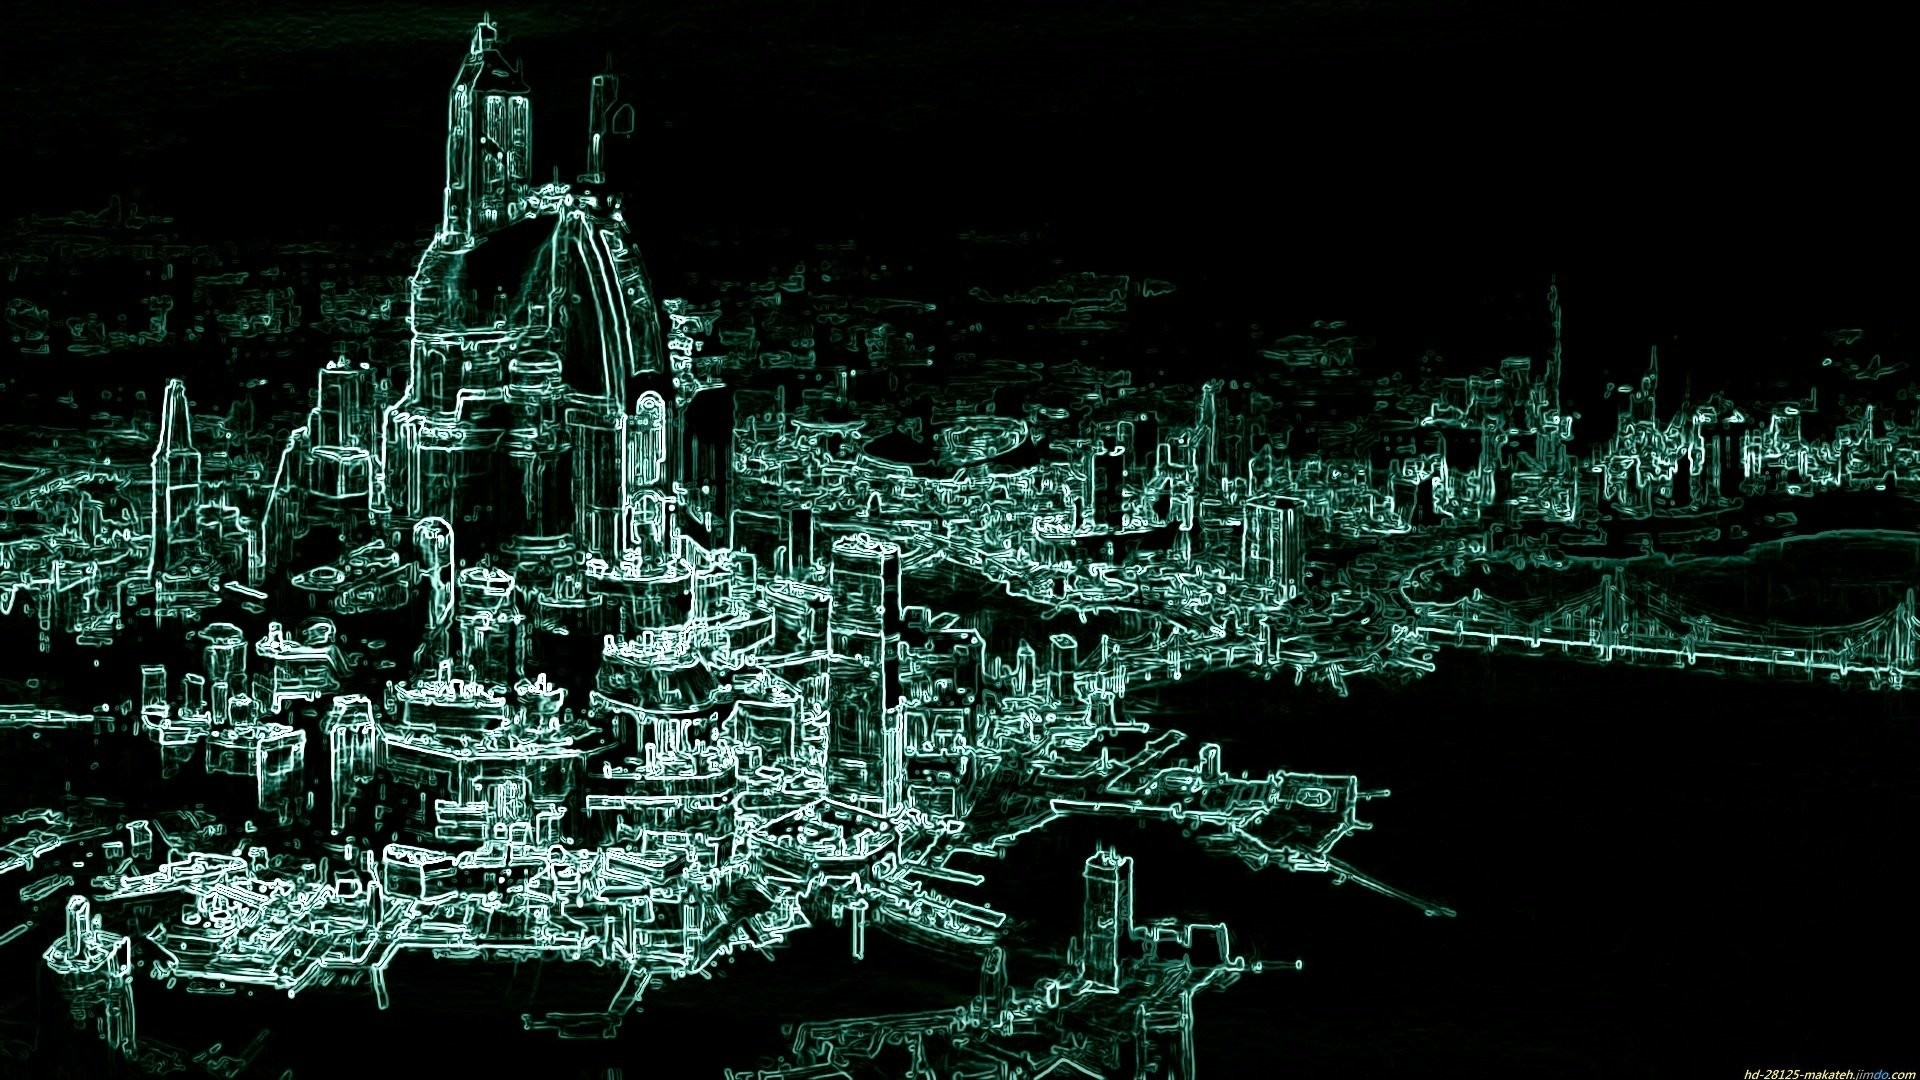 Abstrakt – Science fiction Abstrakt Stad Planet Space Bakgrund